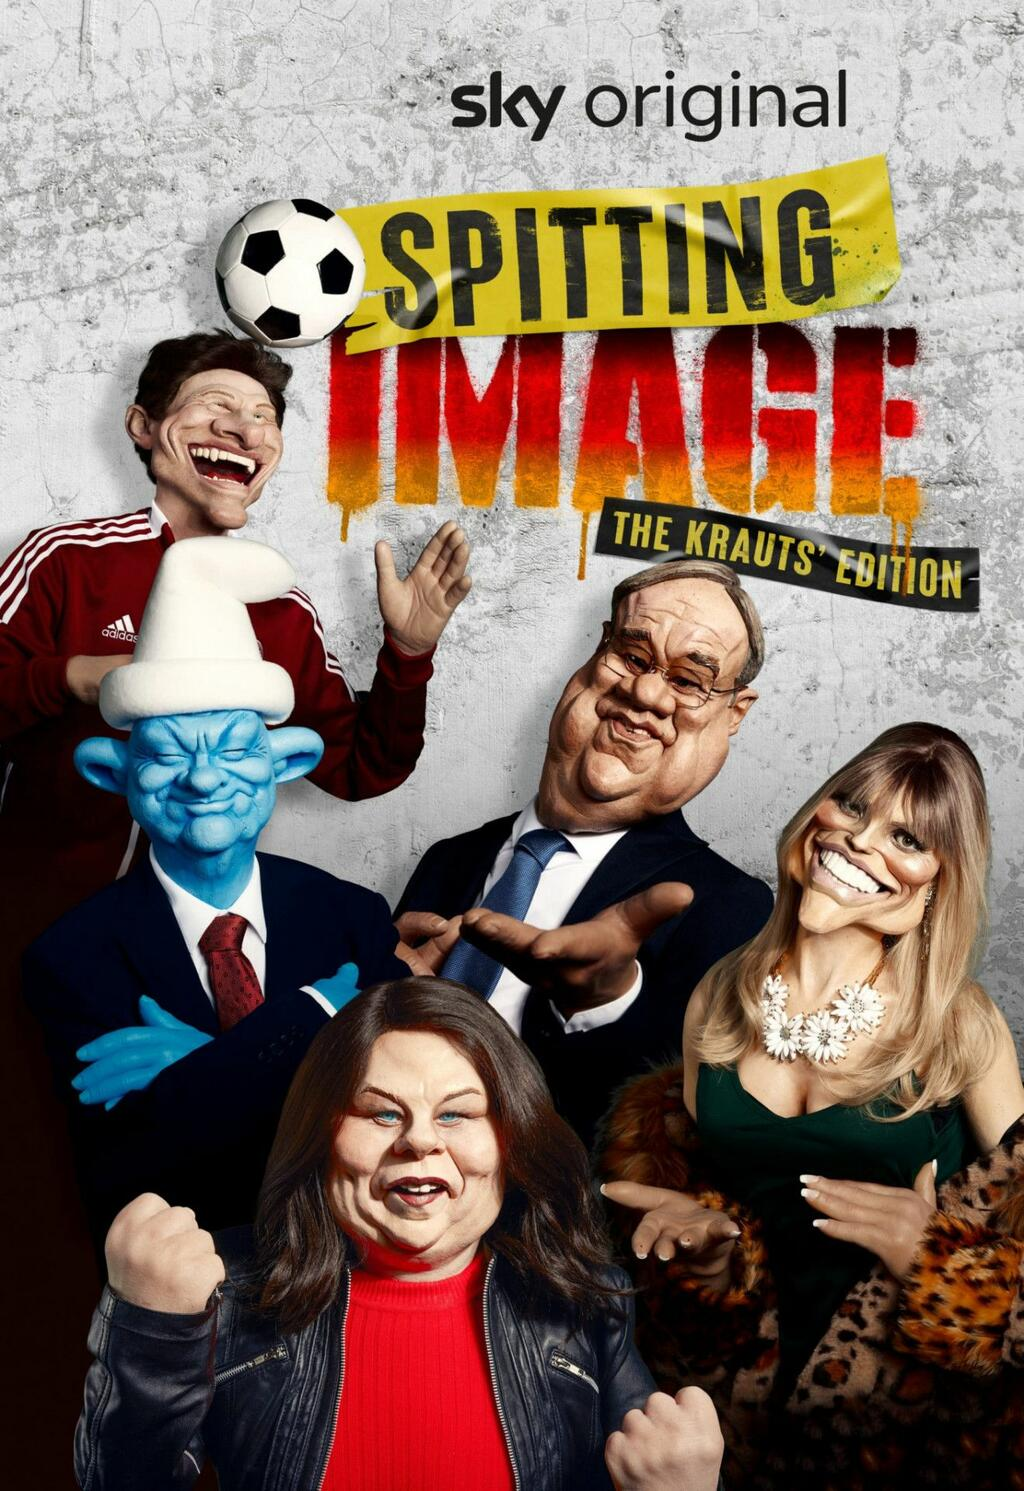 Spitting Image - The Krauts' Edition